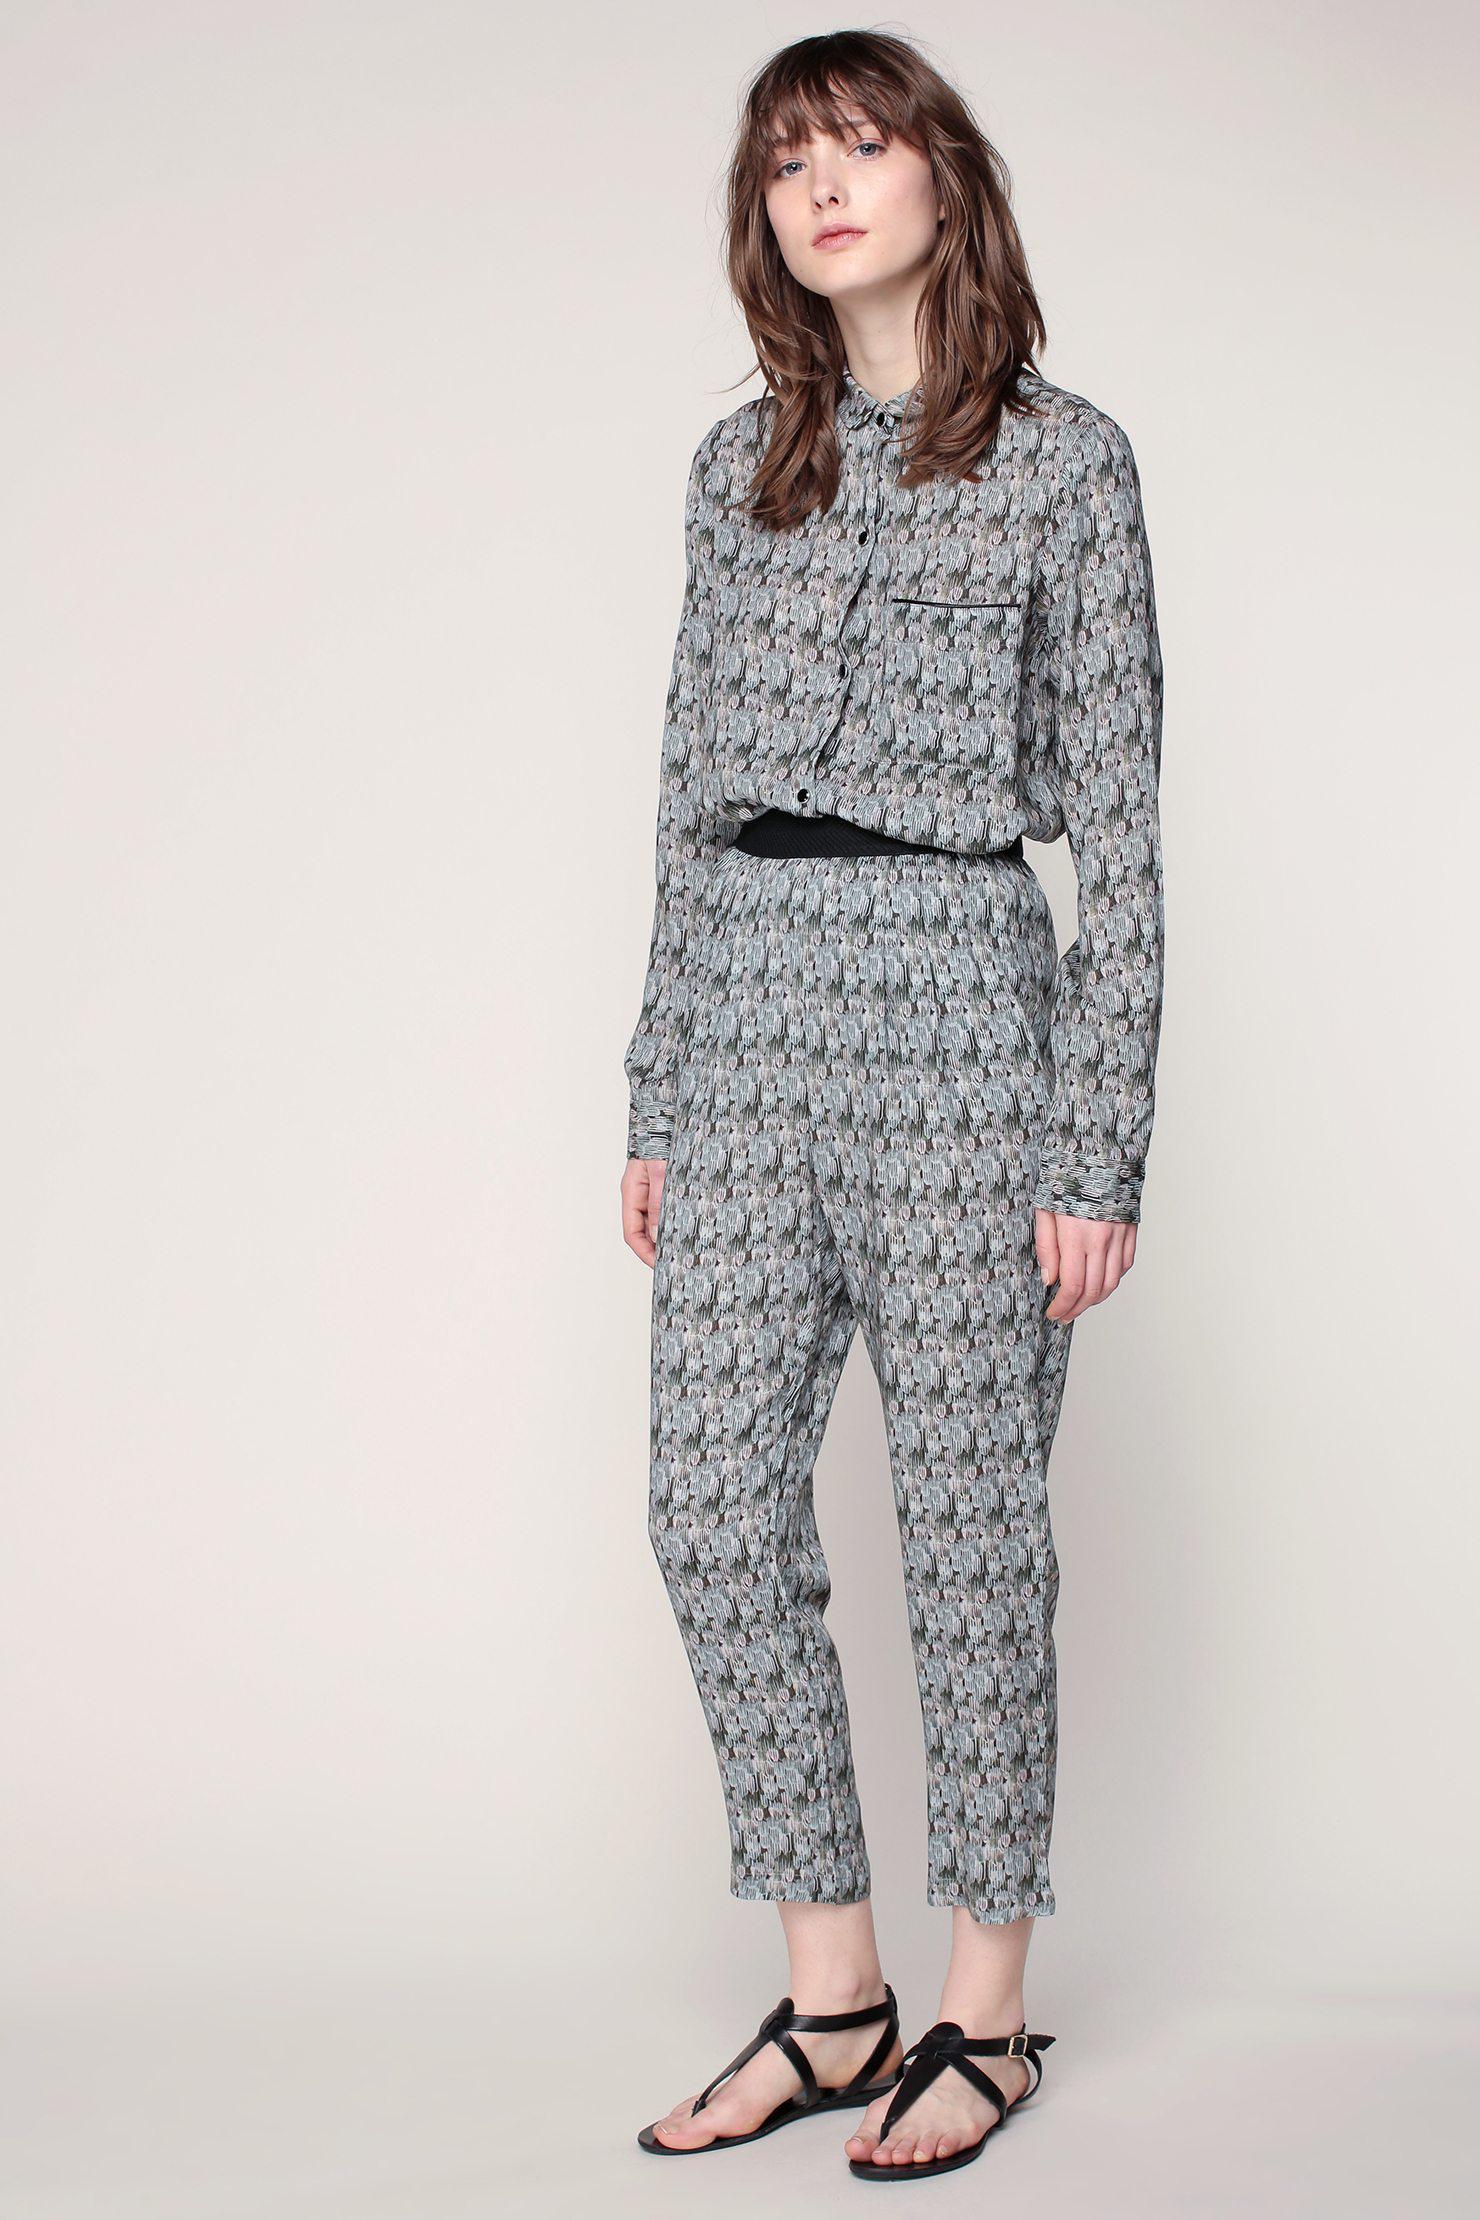 TROUSERS - Casual trousers MAISON OLGA Cheap Newest Discount Very Cheap Footlocker Cheap Price Cheap Big Sale Sunshine owGNqH5DLW